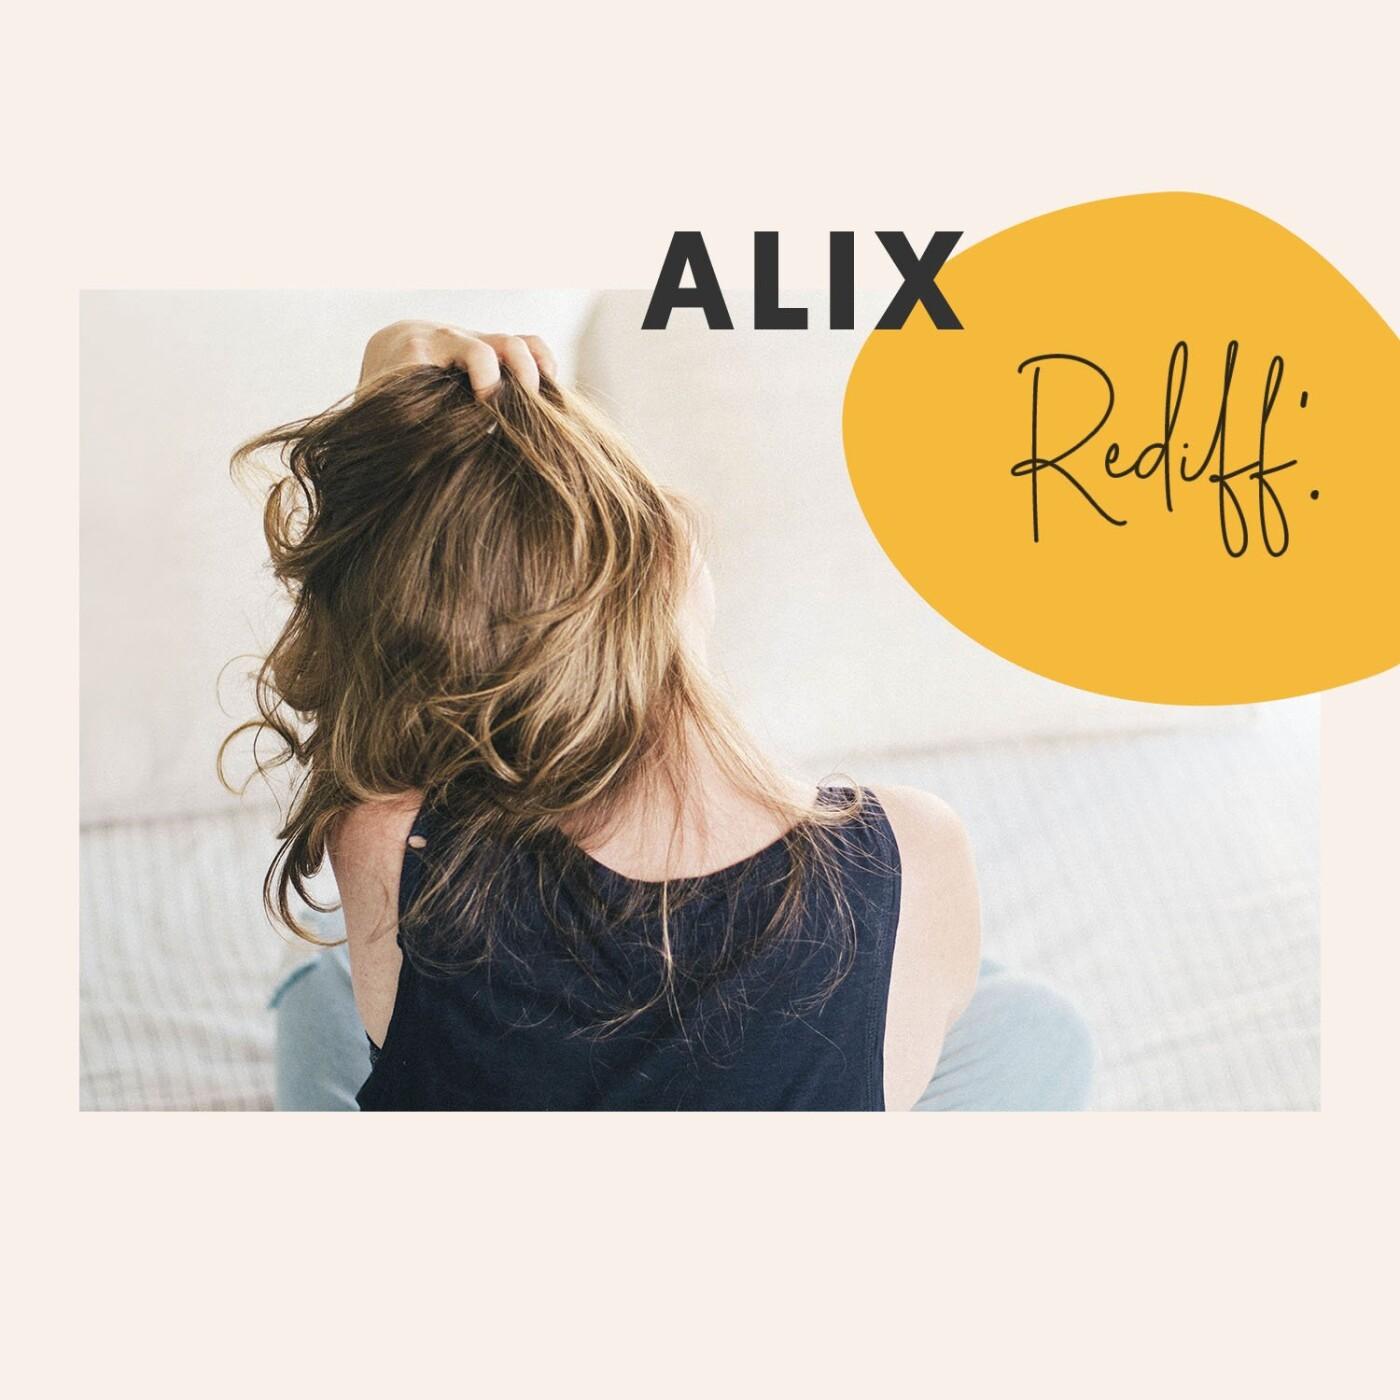 Rediff' • Alix